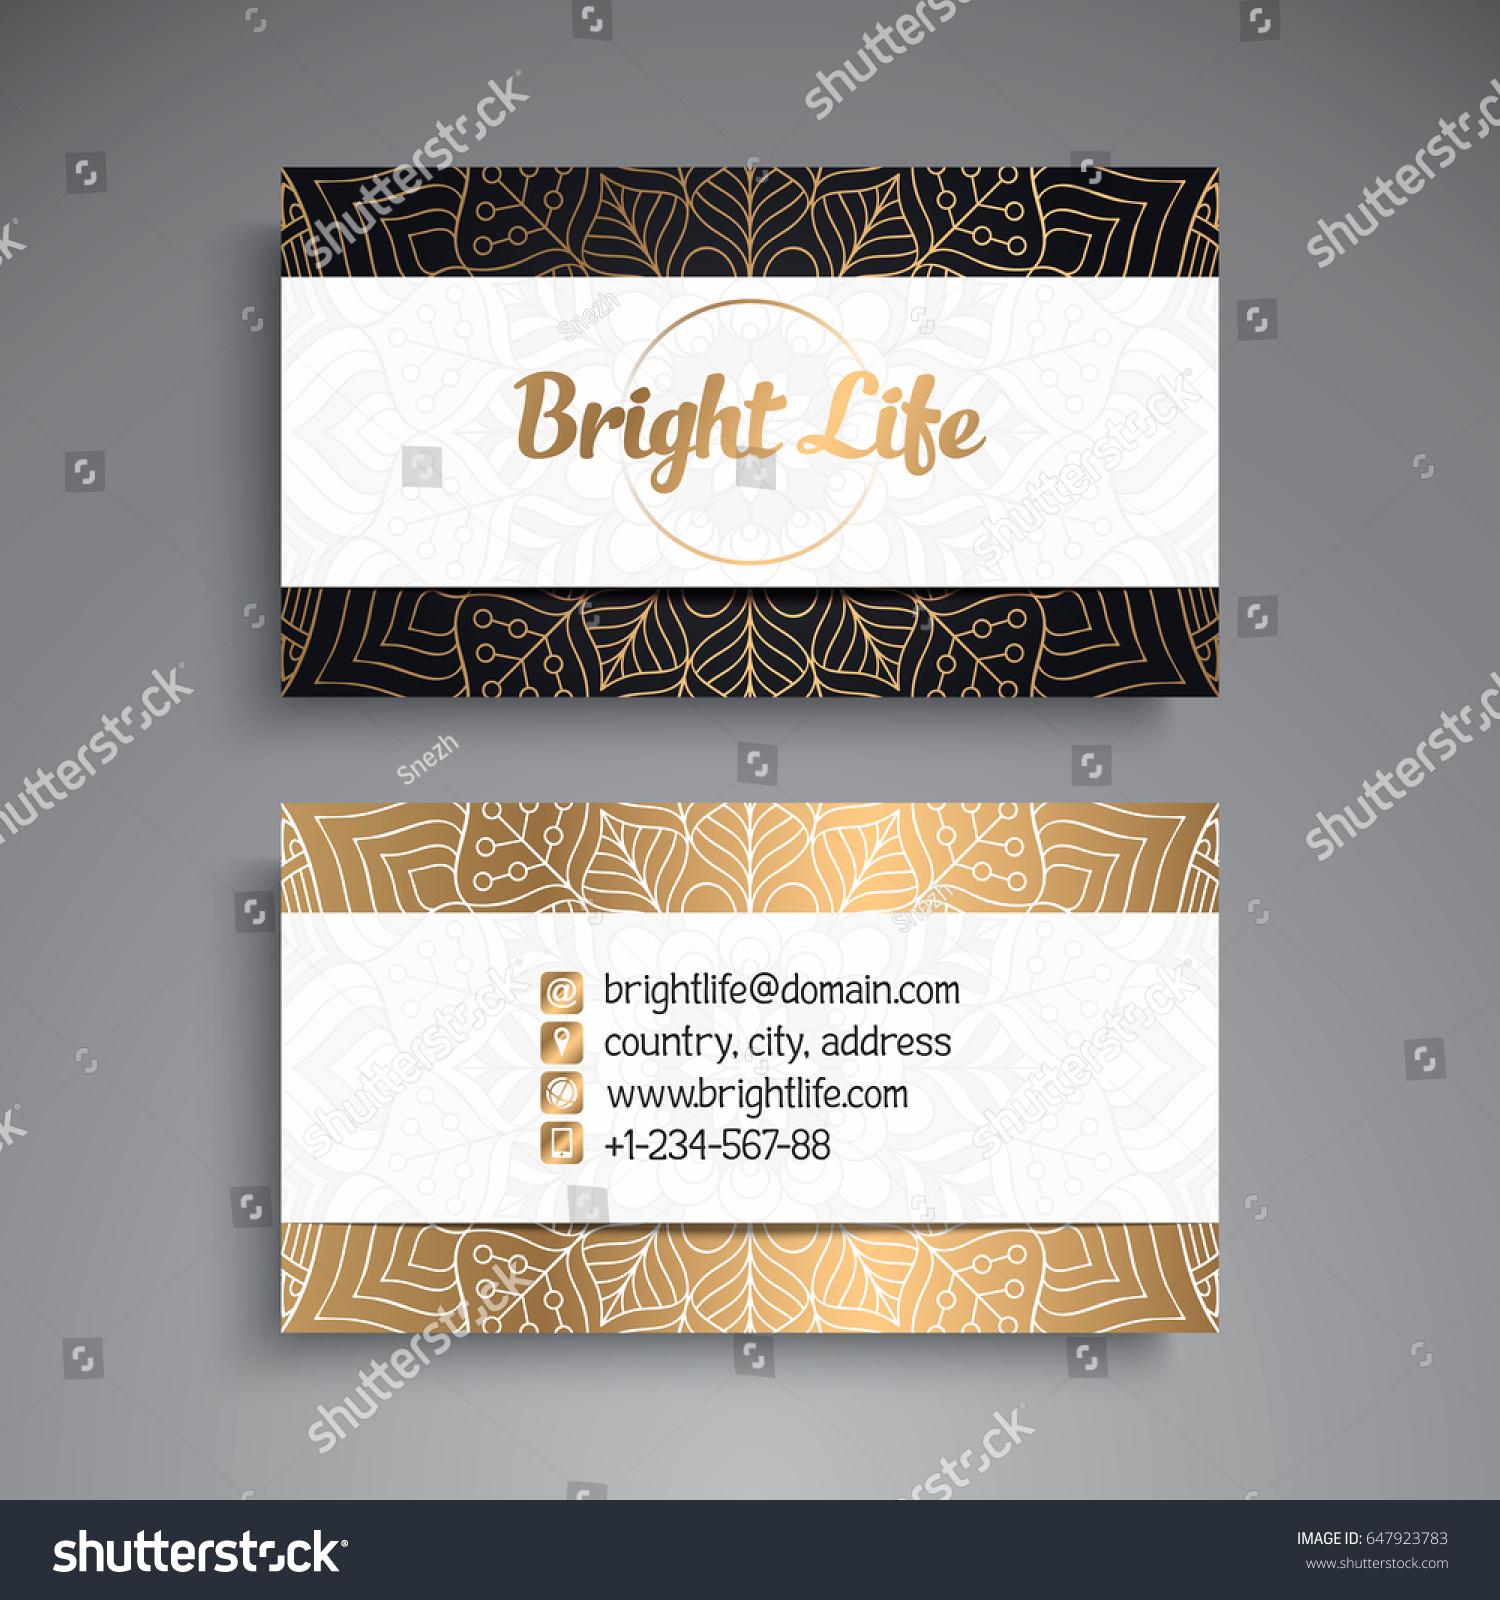 Business Card Vintage Decorative Elements Ornamental Stock Vector ...